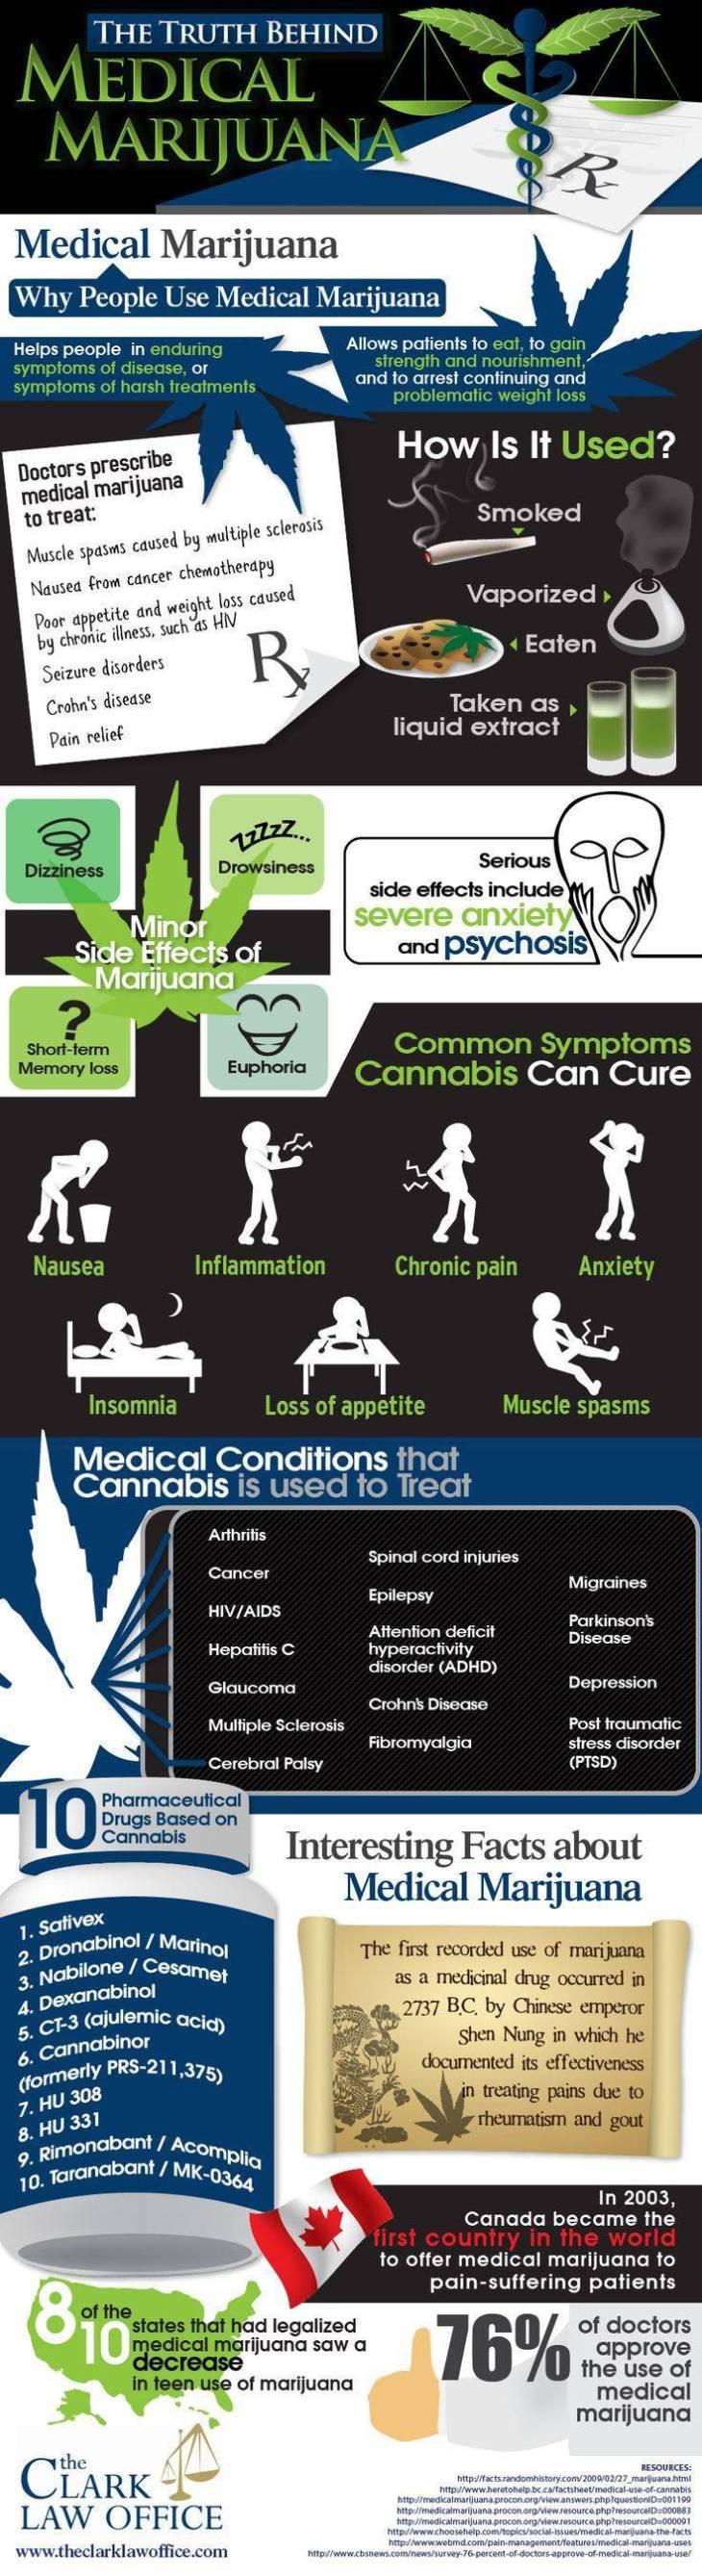 the-truth-behind-medical-marijuana-1